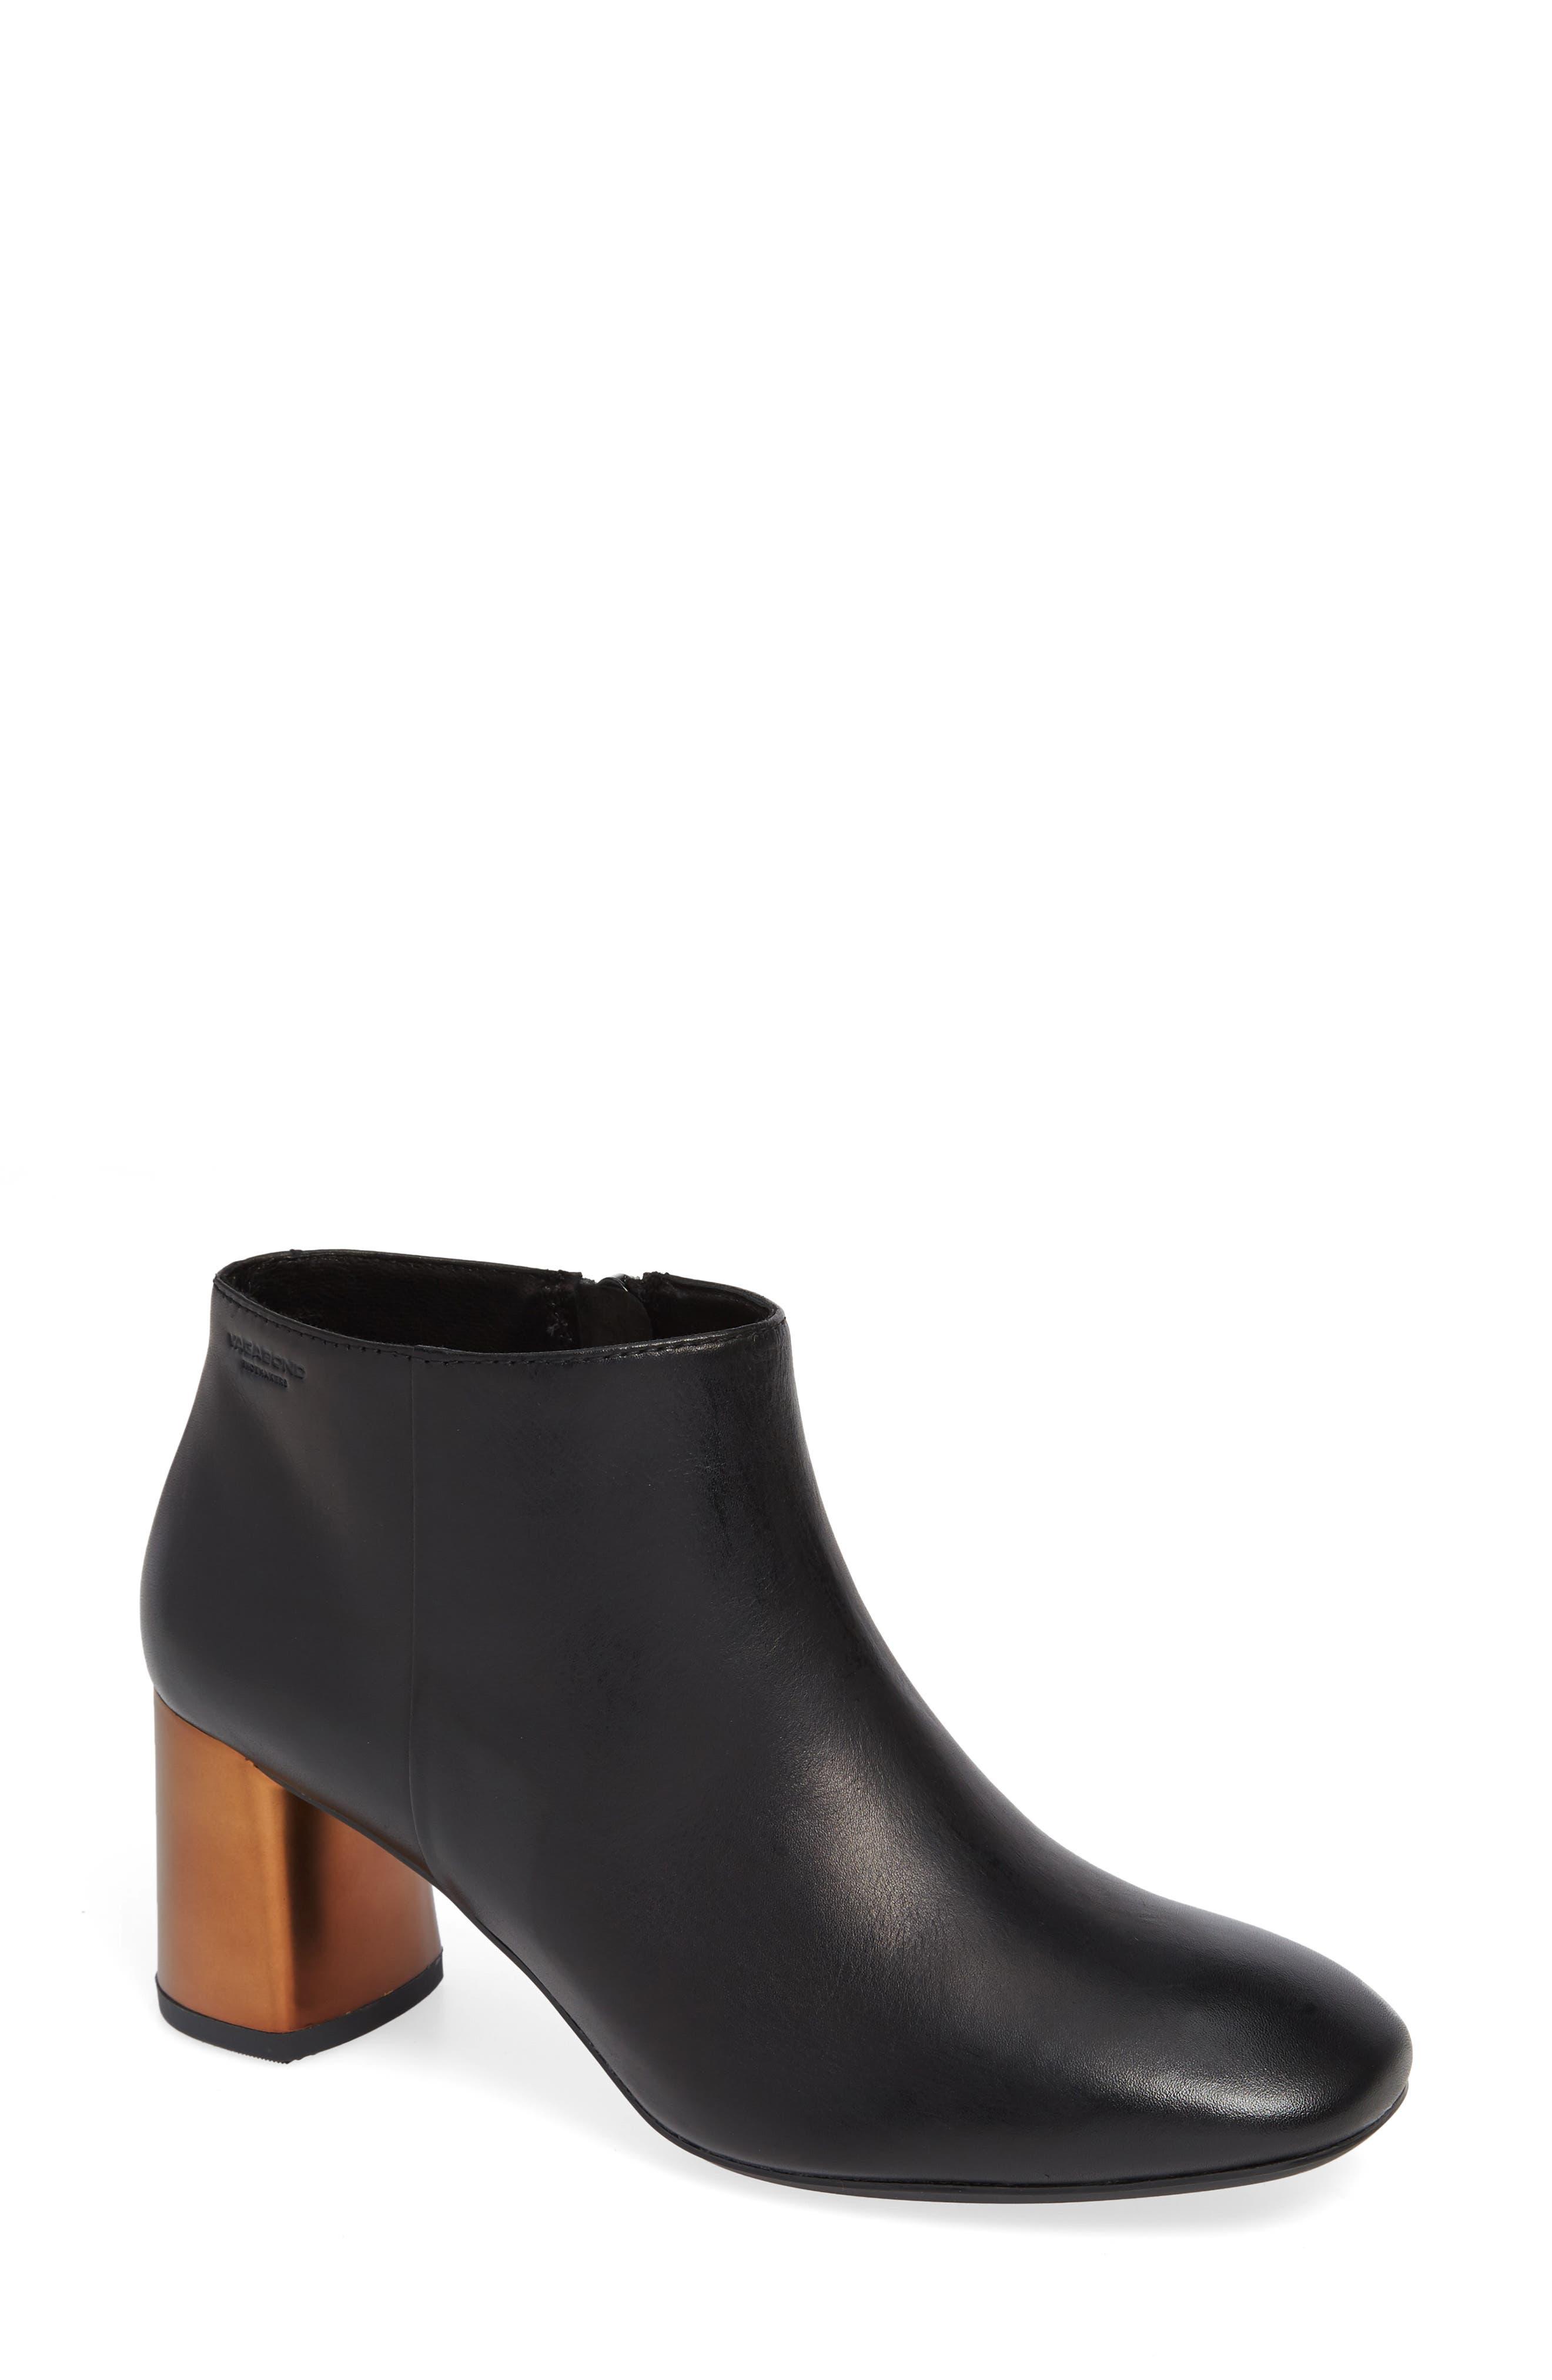 Vagabond Shoemakers Jeena Flared Heel Bootie, Black